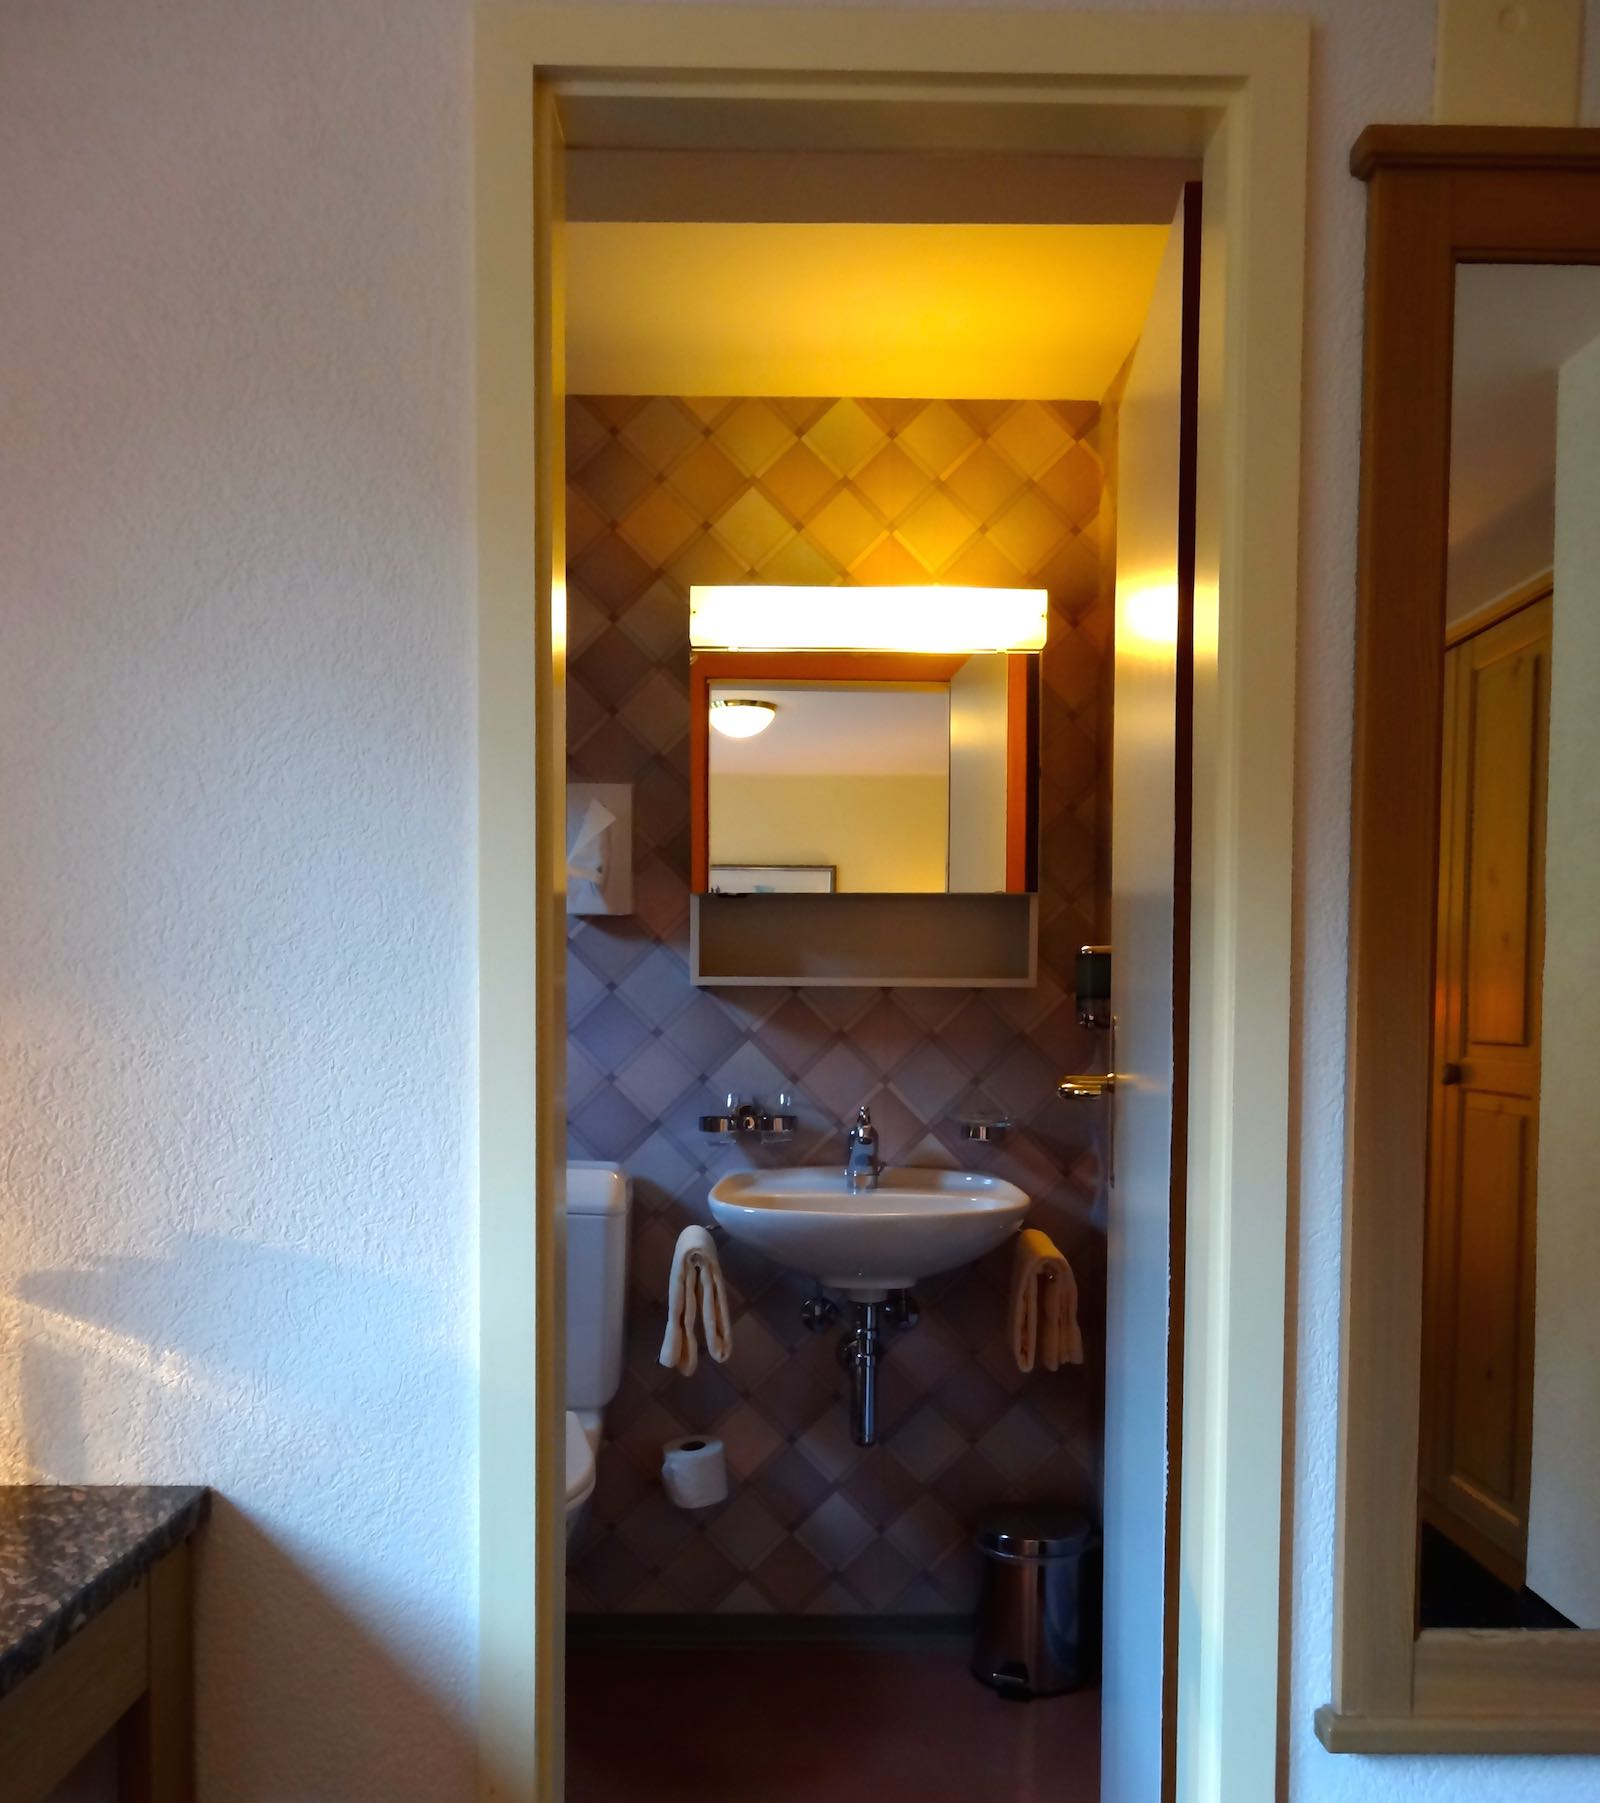 http://hoteljungfrau.ch/wp-content/uploads/2014/11/standard-zimmer-5.jpg